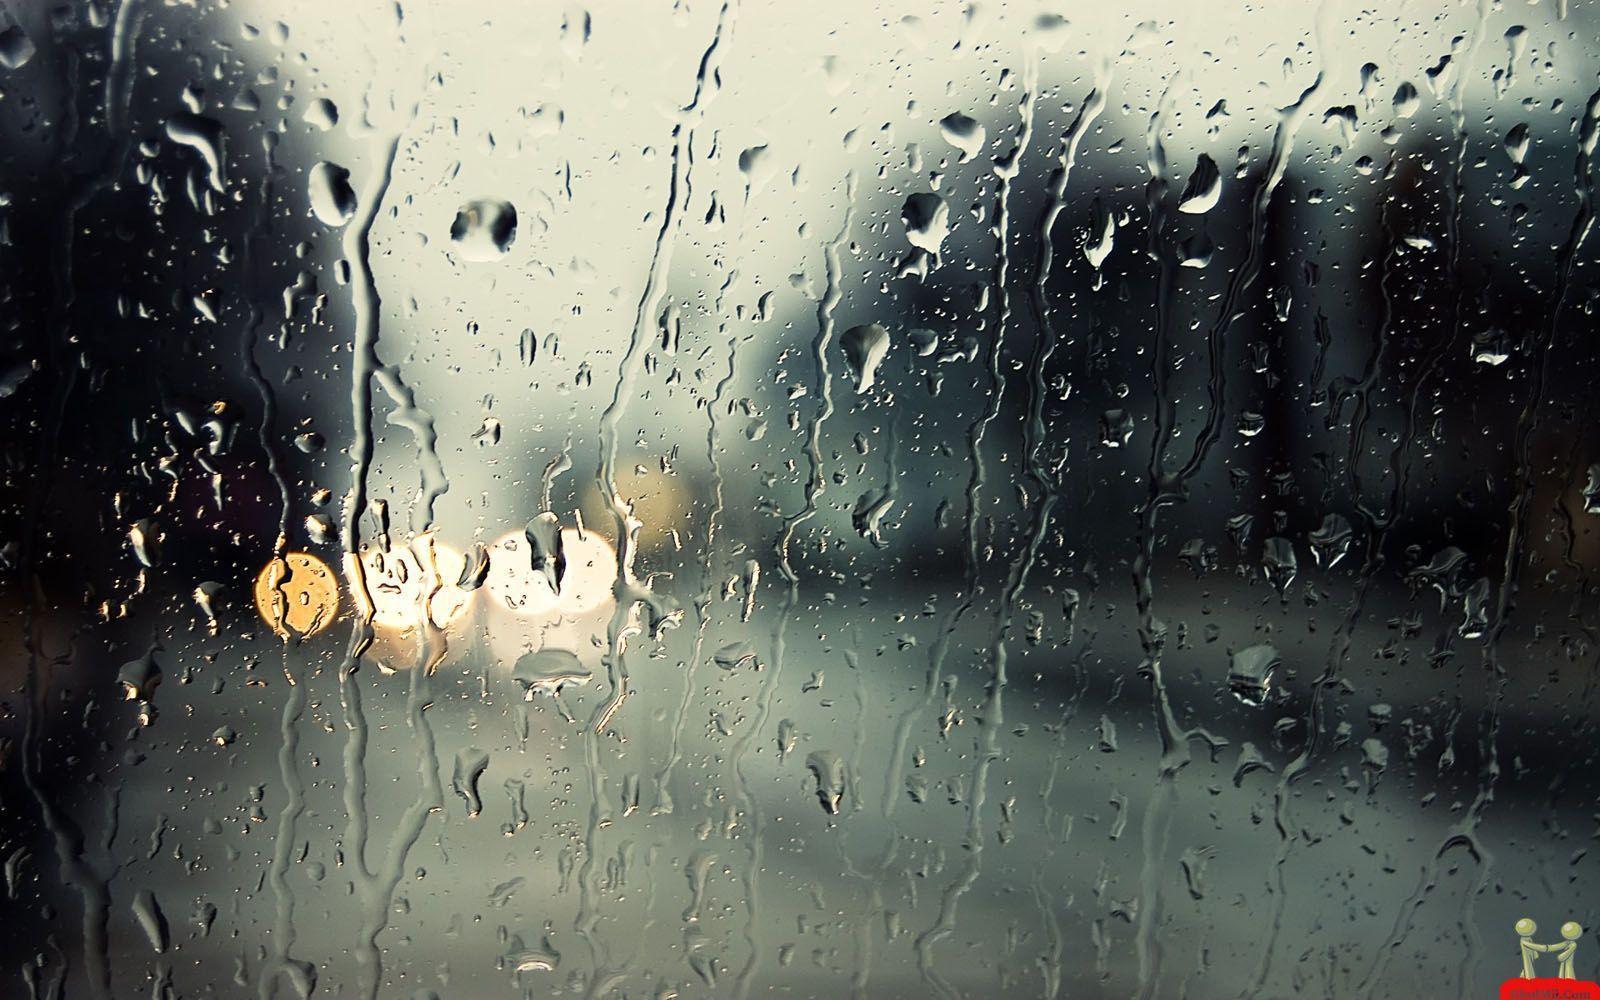 Rain HD PC Wallpapers - HD Wallpapers Inn